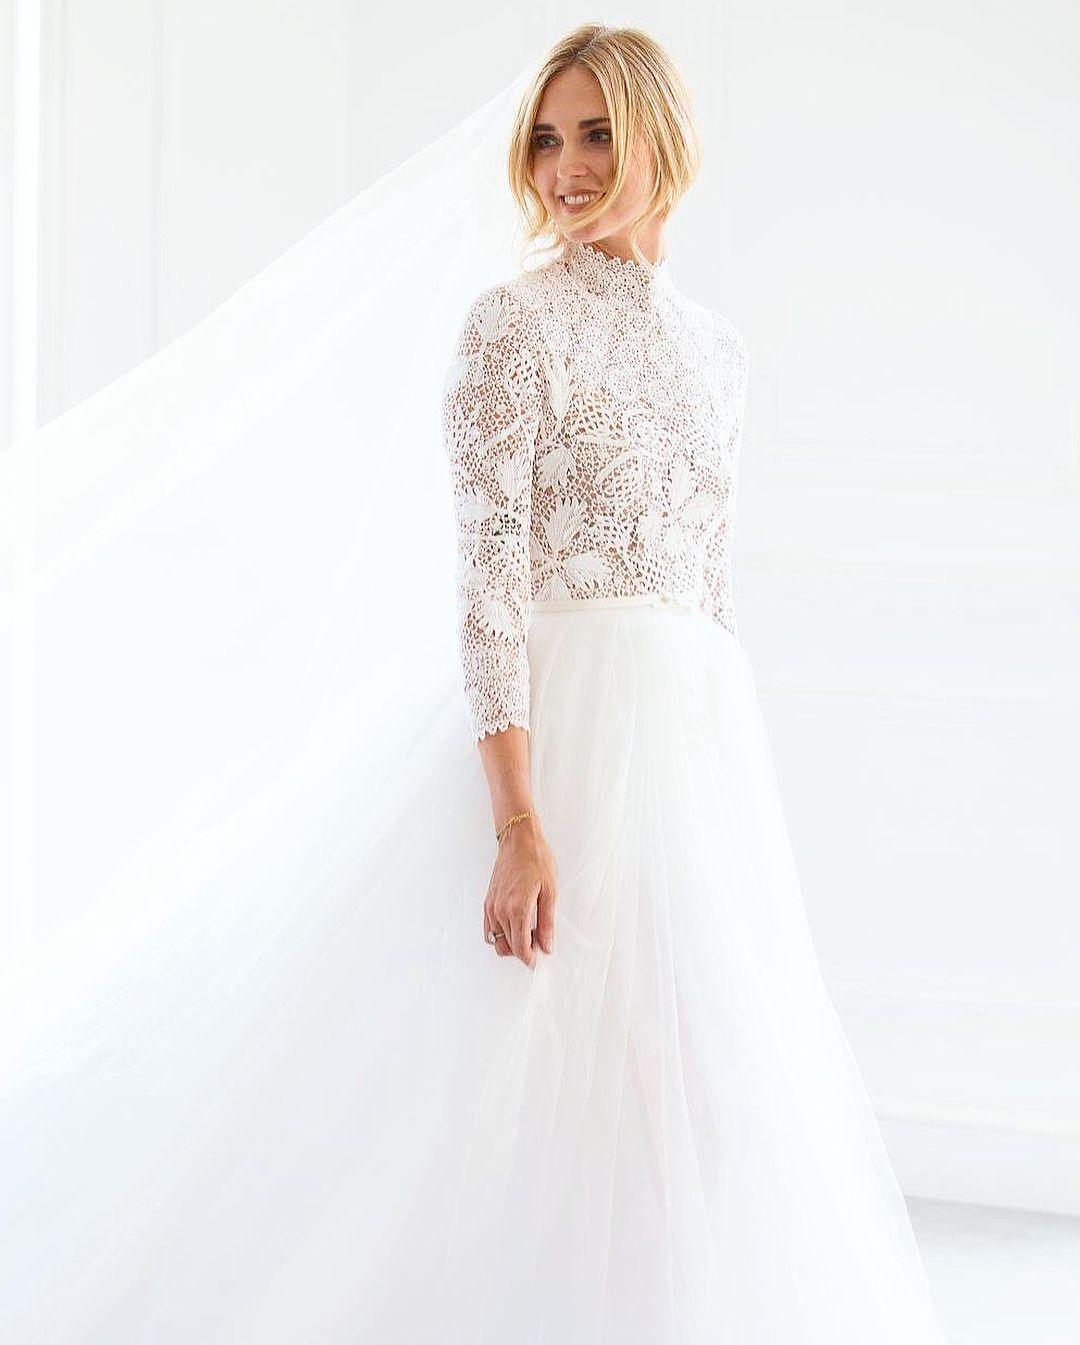 Dior wedding dresses  Apple iPhone  GB